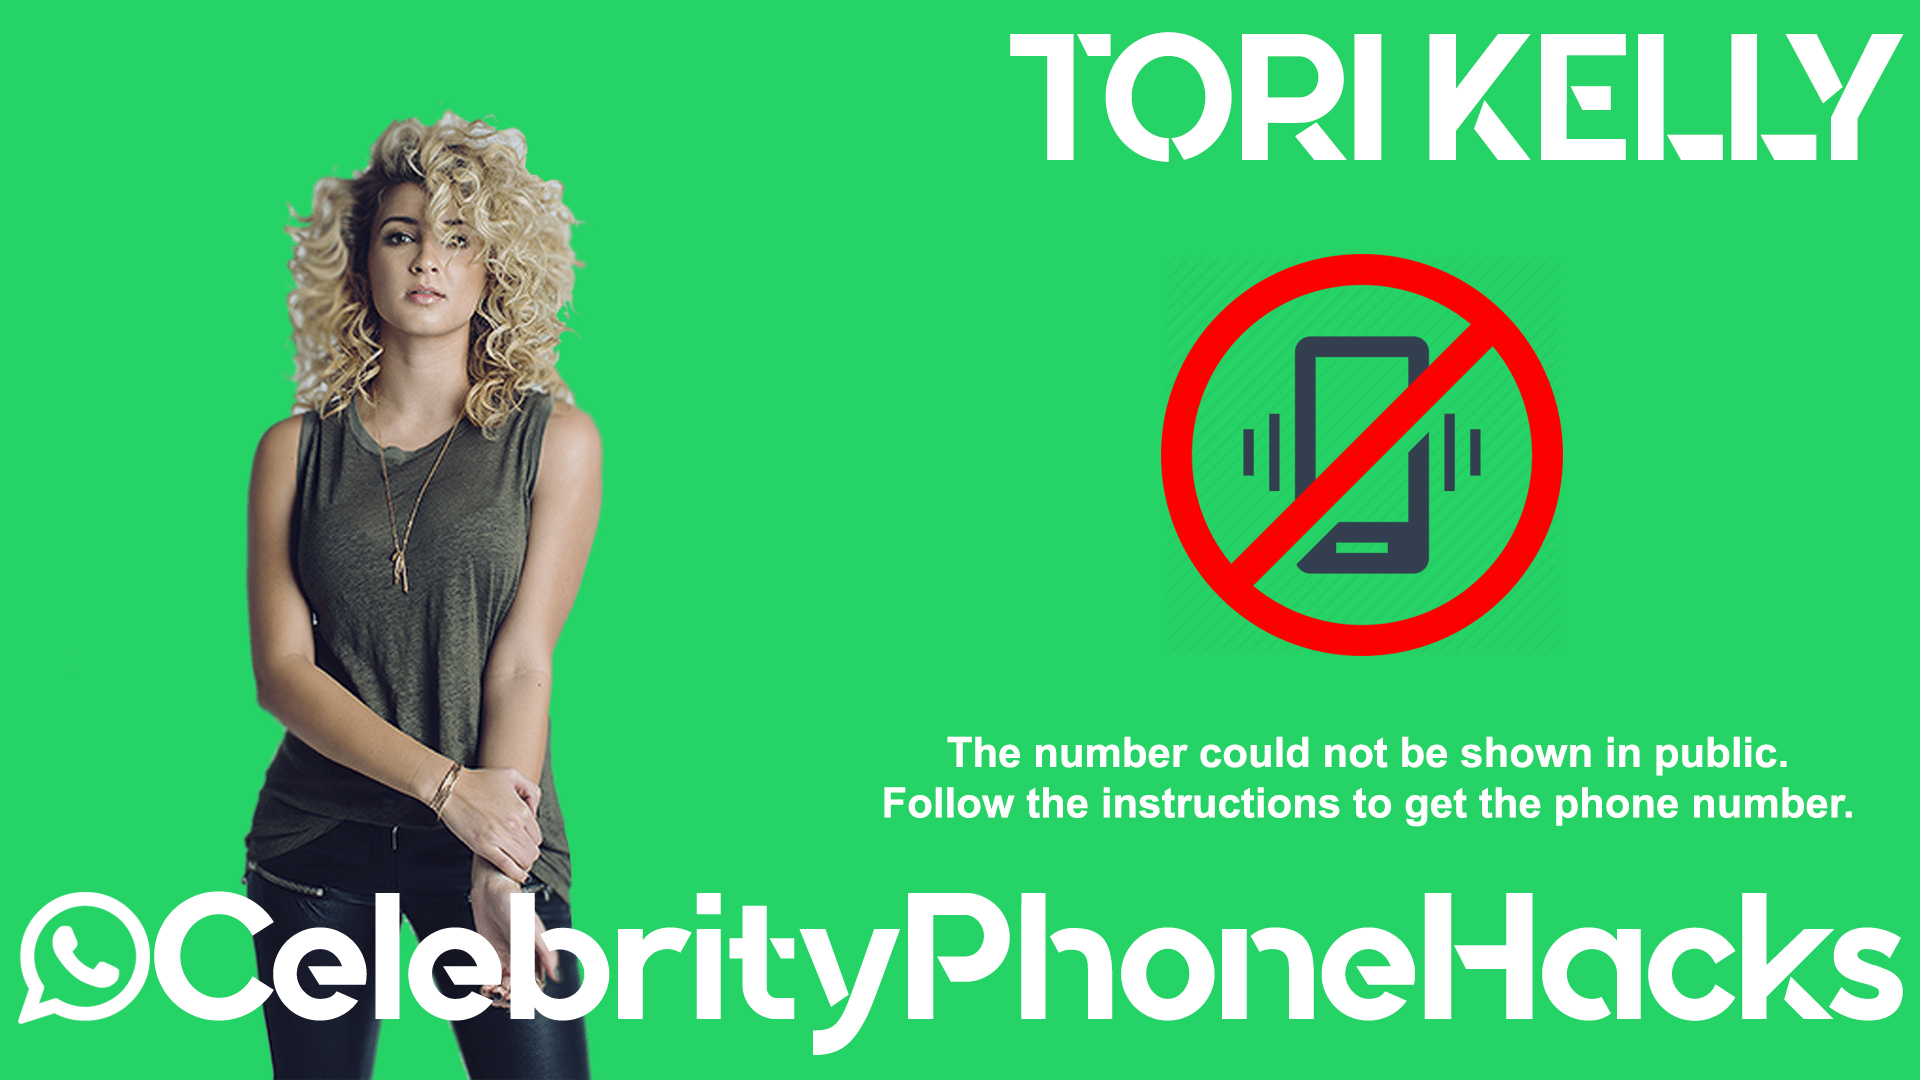 Tori Kelly real phone number 2019 whatsapp hacked leaked